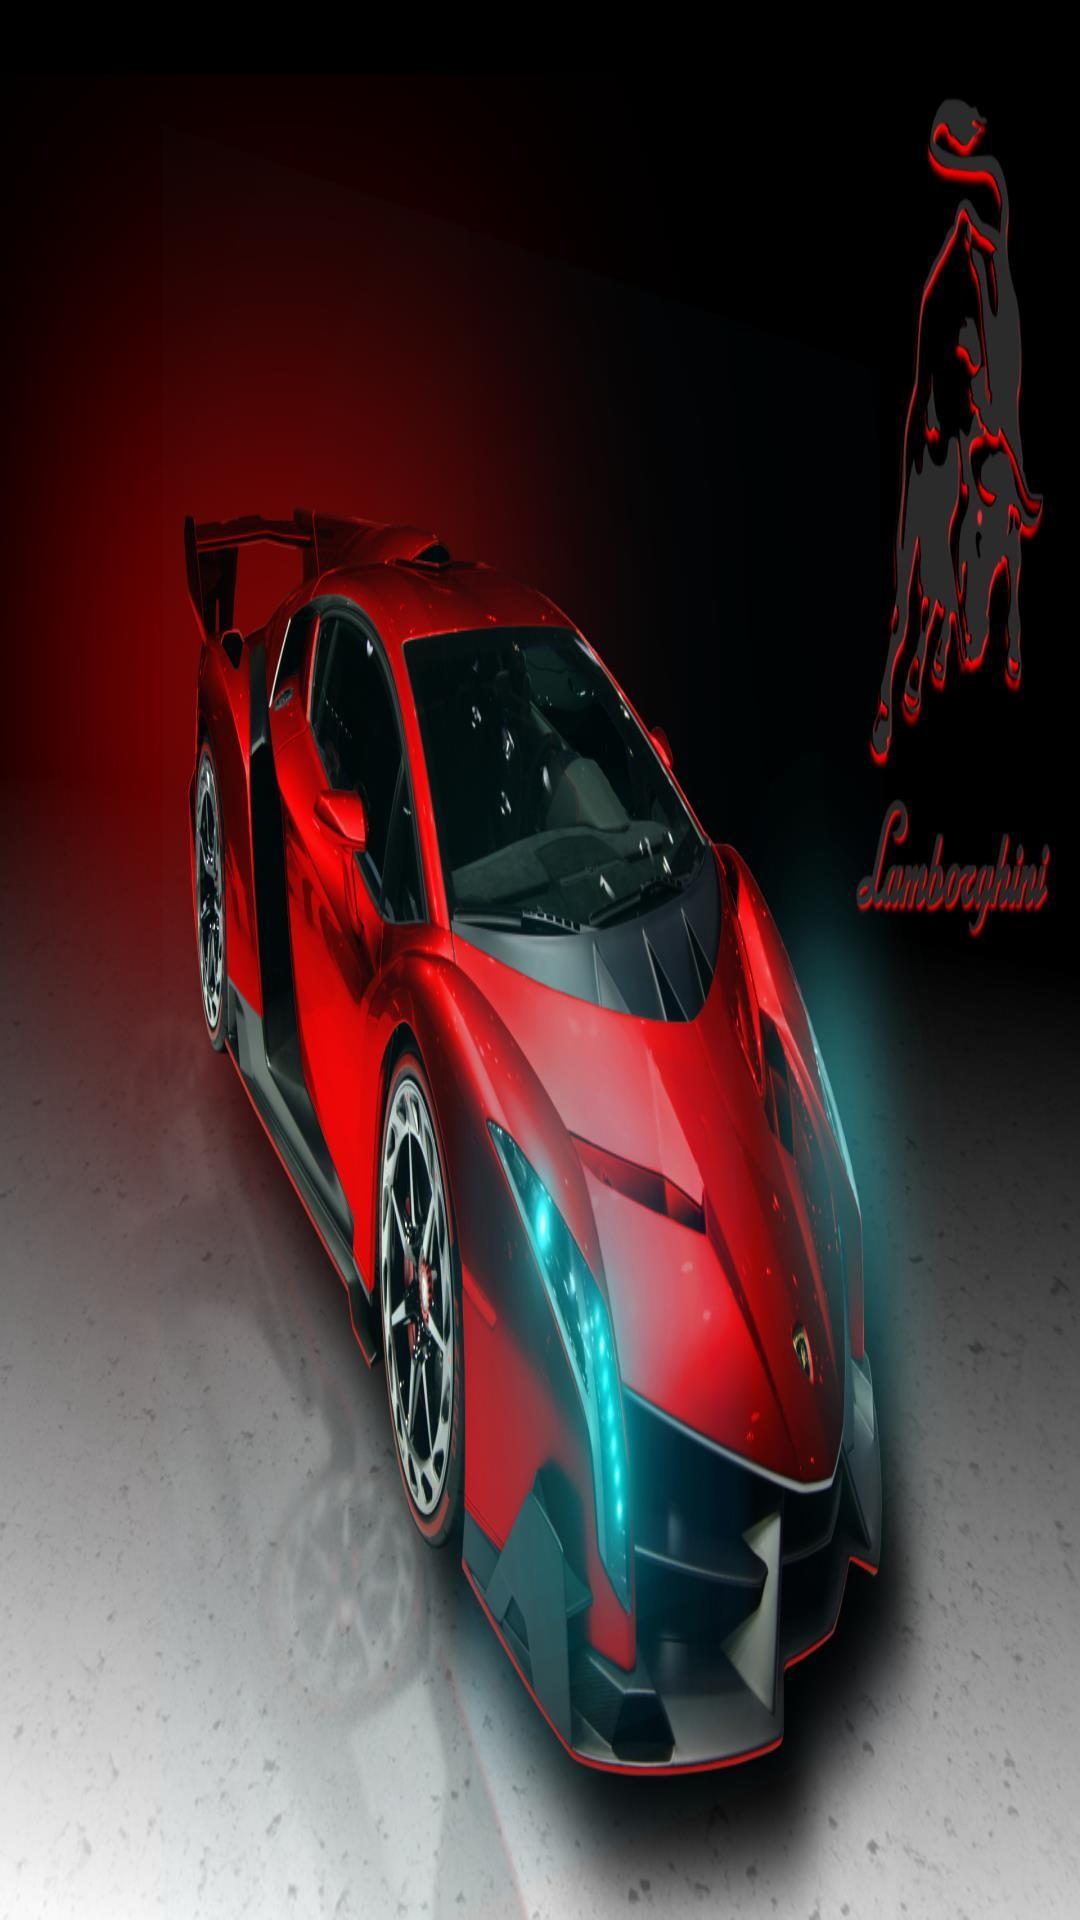 Lamborghini Veneno Roadster Wallpaper Hd Lamborghini Veneno Wallpapers 64 Images